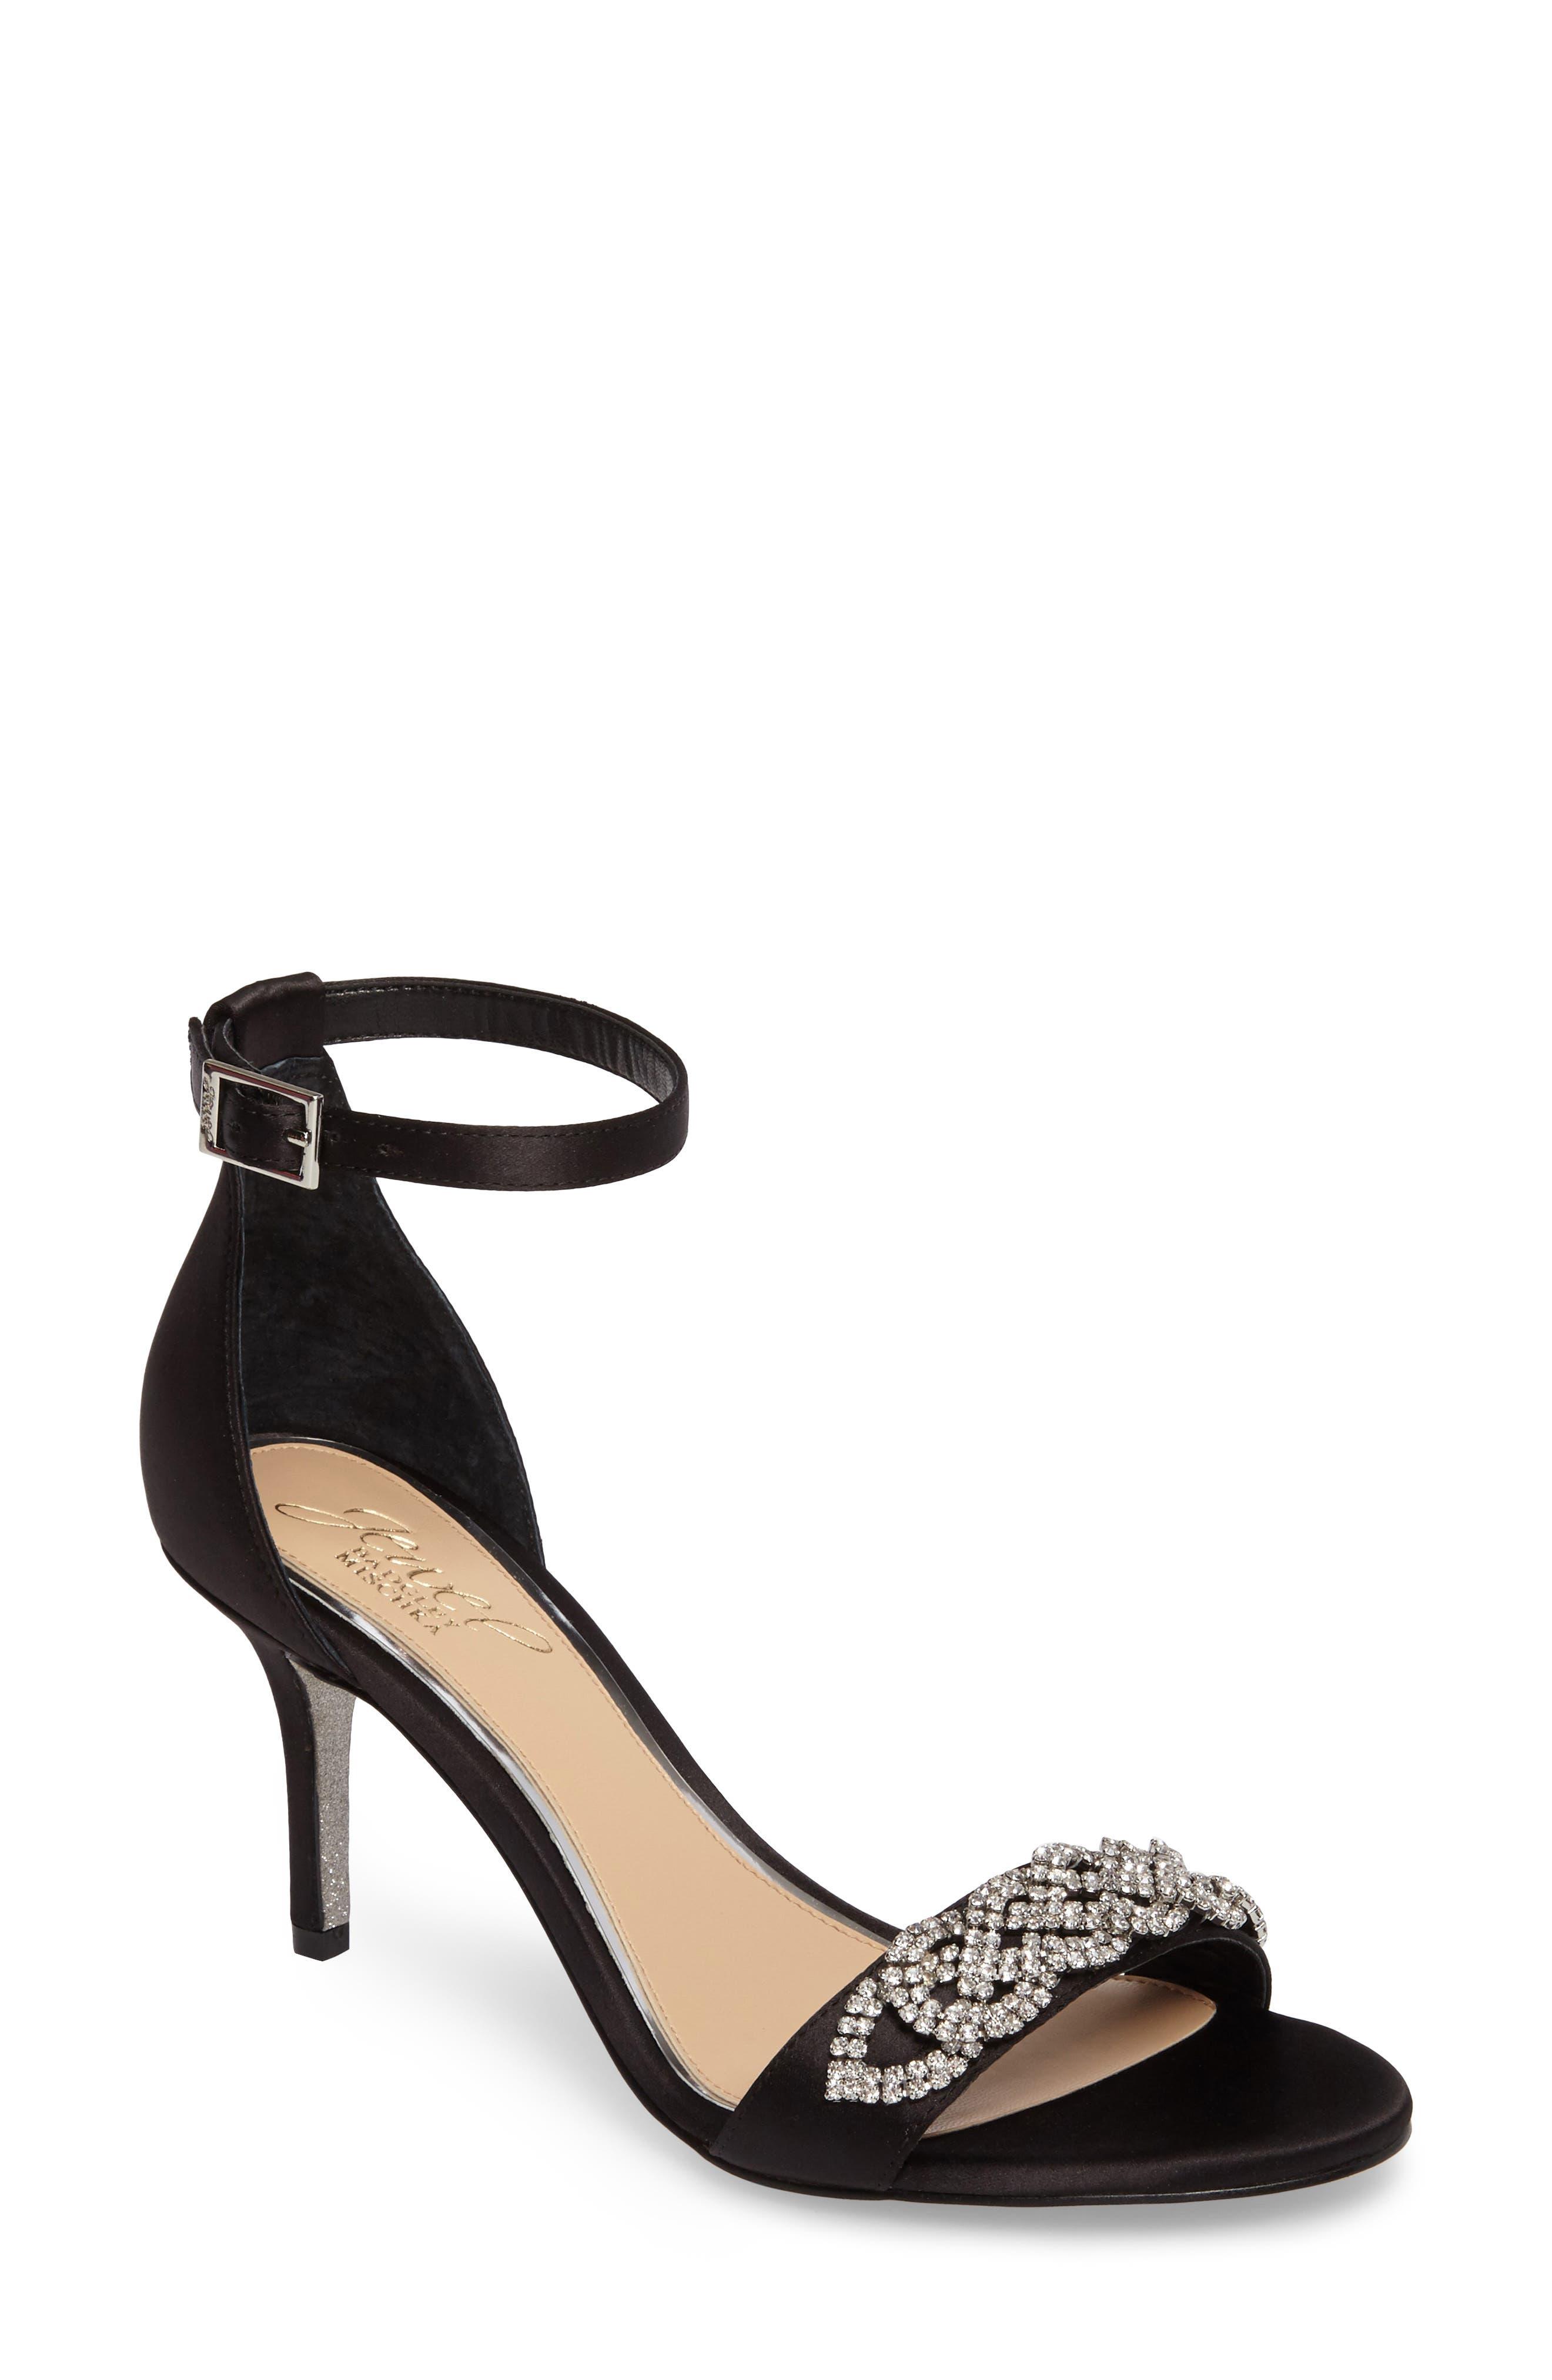 Alternate Image 1 Selected - Jewel Badgley Mischka Alana Ankle Strap Sandal (Women)